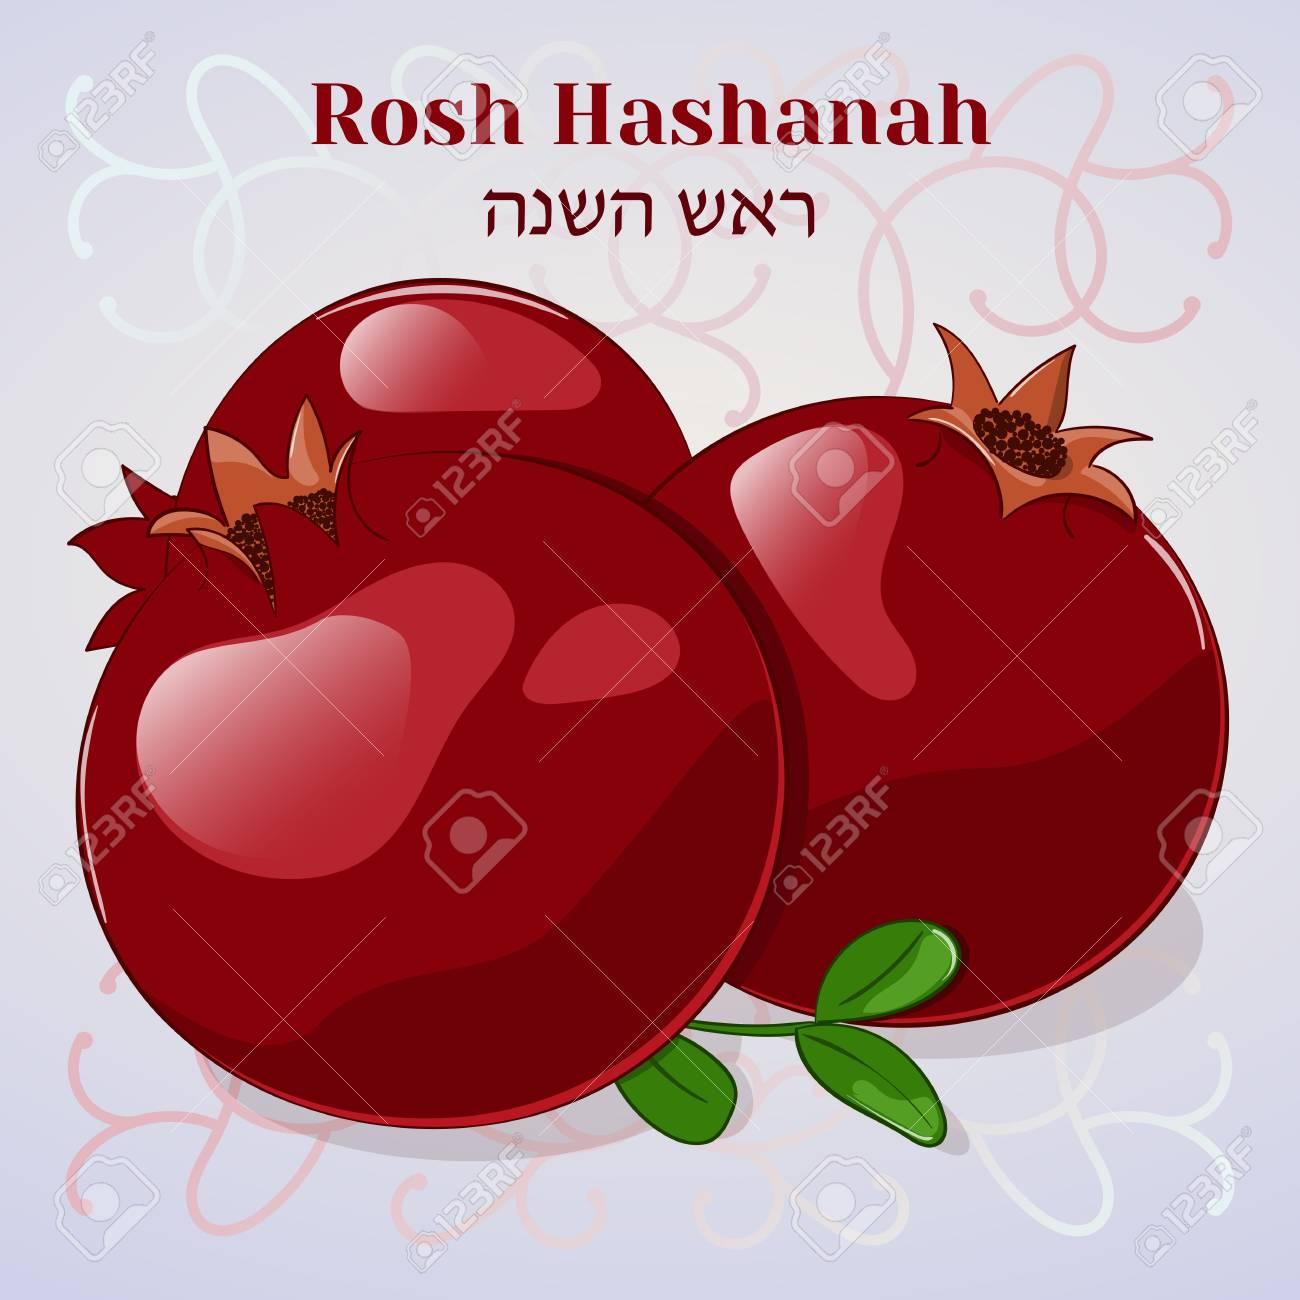 Rosh Hashanah Jewish New Year Greeting Card With Pomegranate